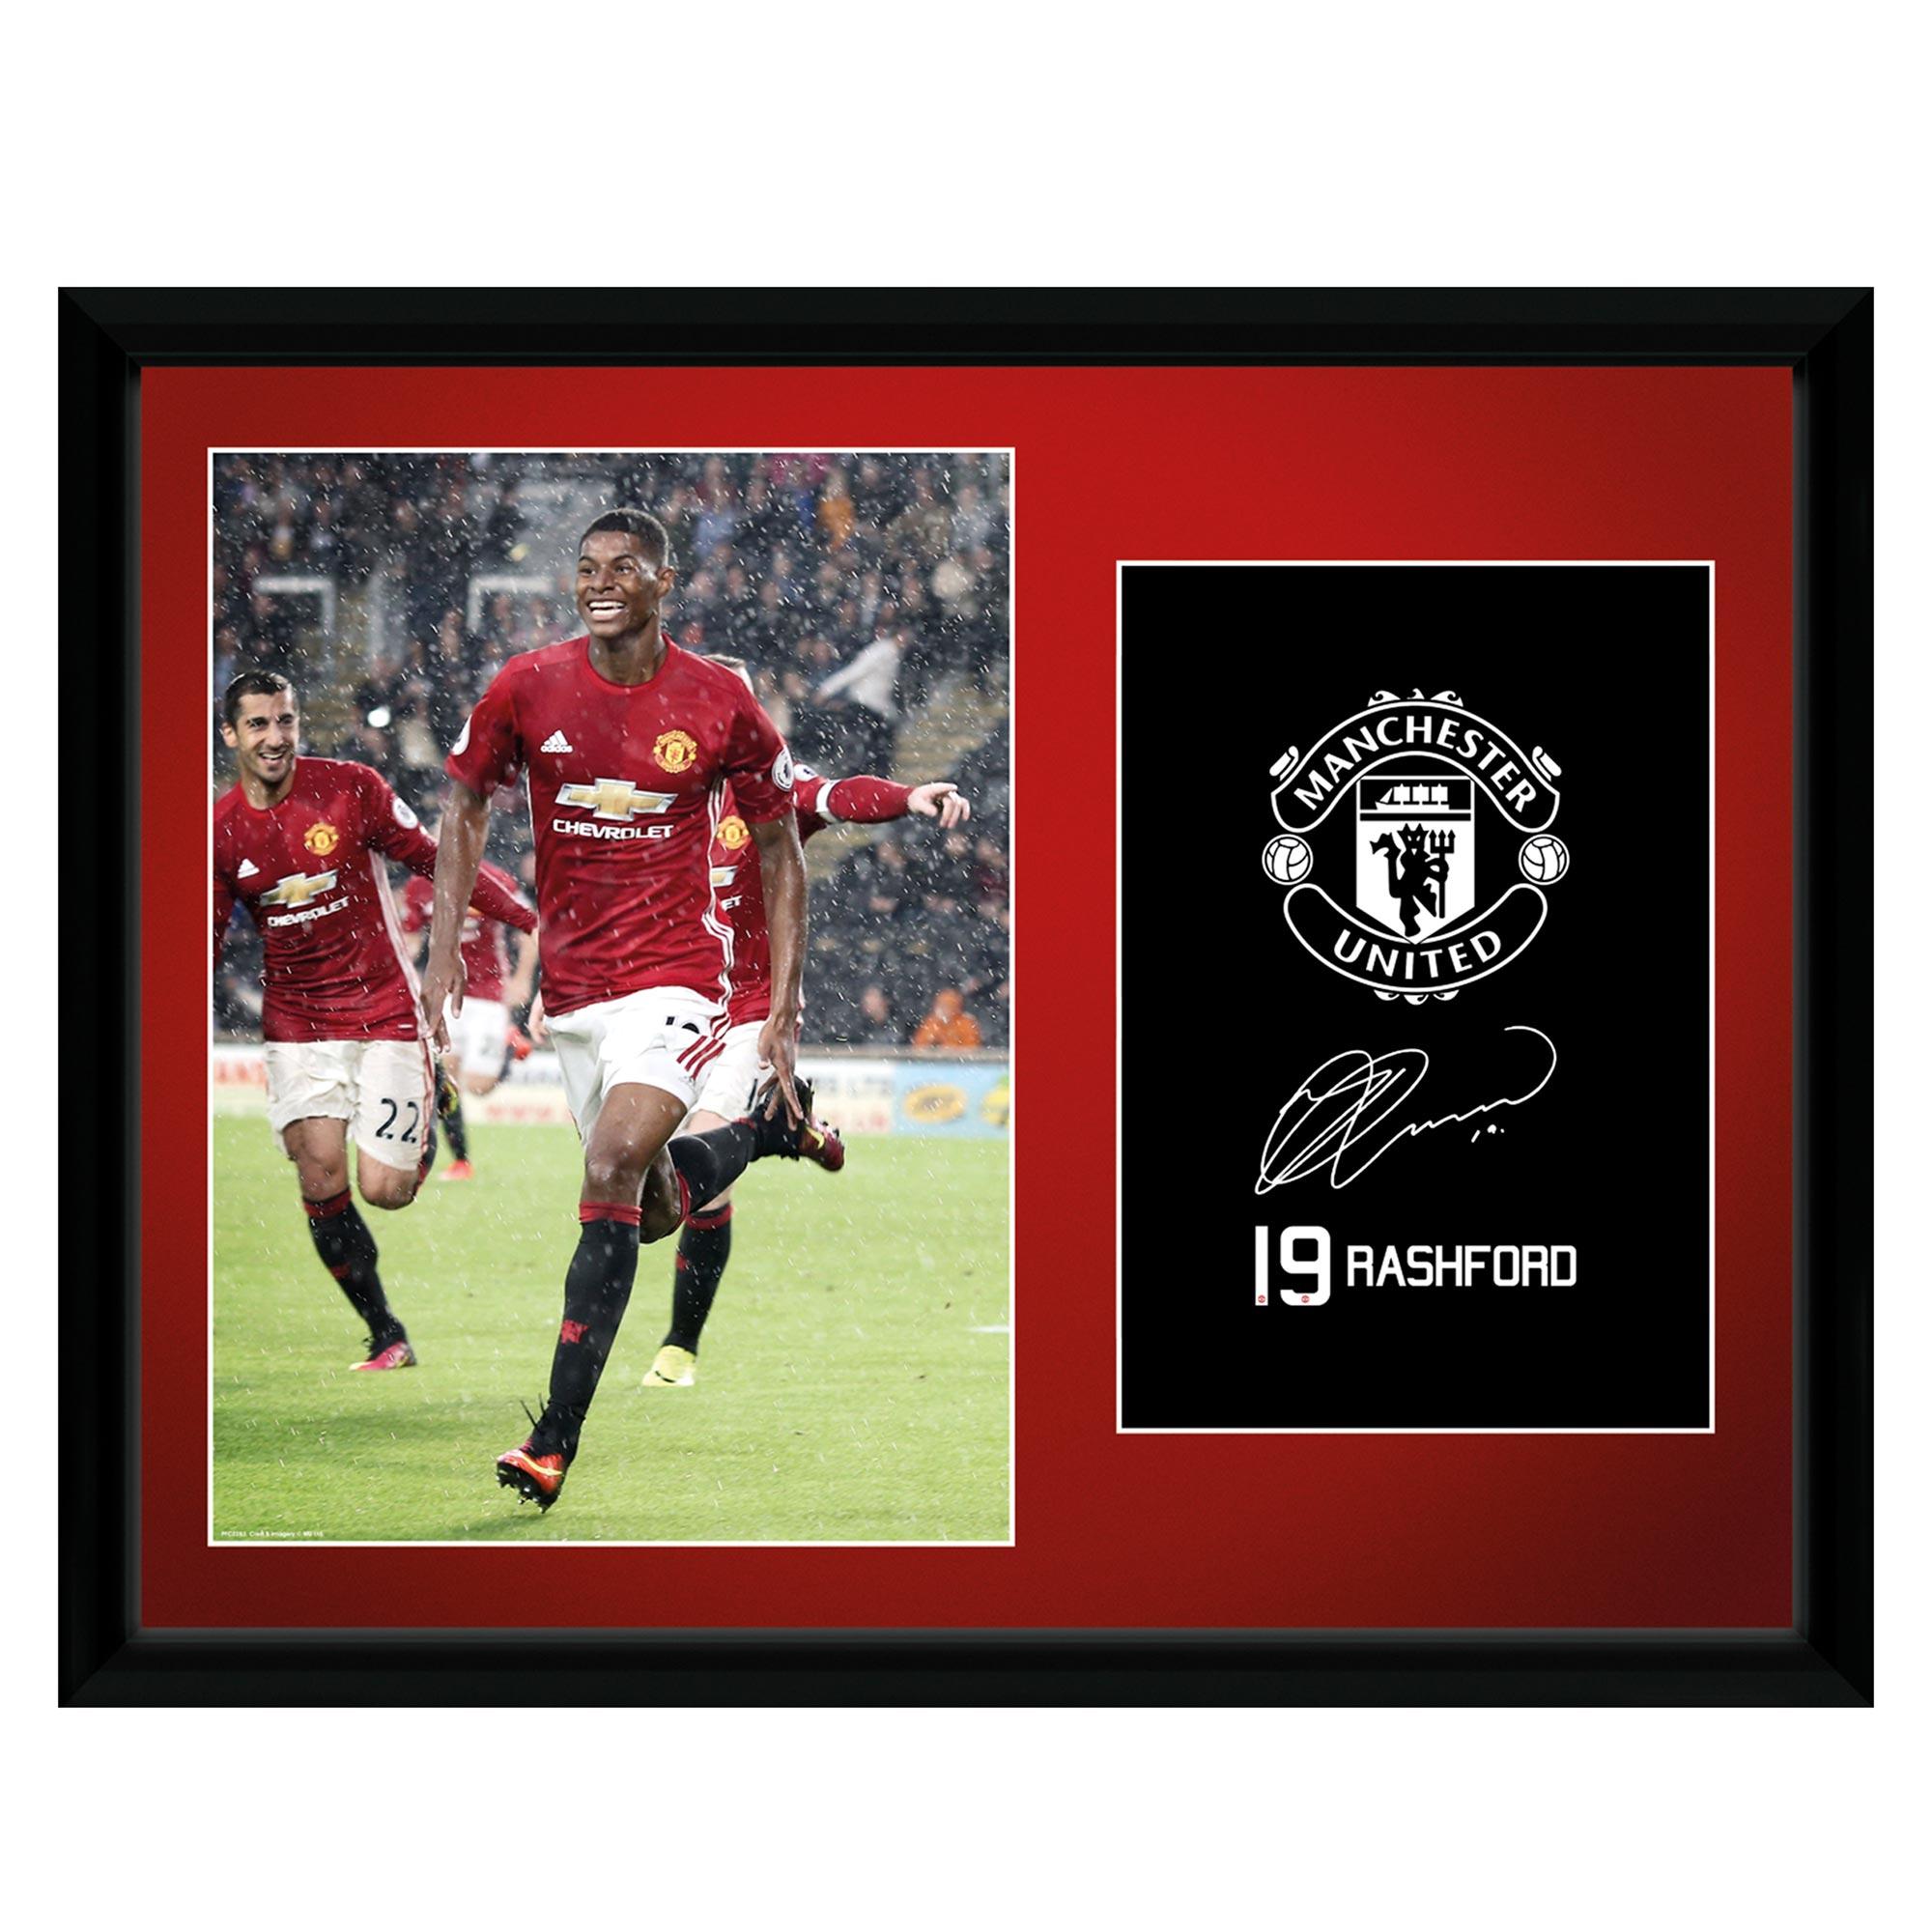 Manchester United 16-17 Rashford Framed Print 16 x 12